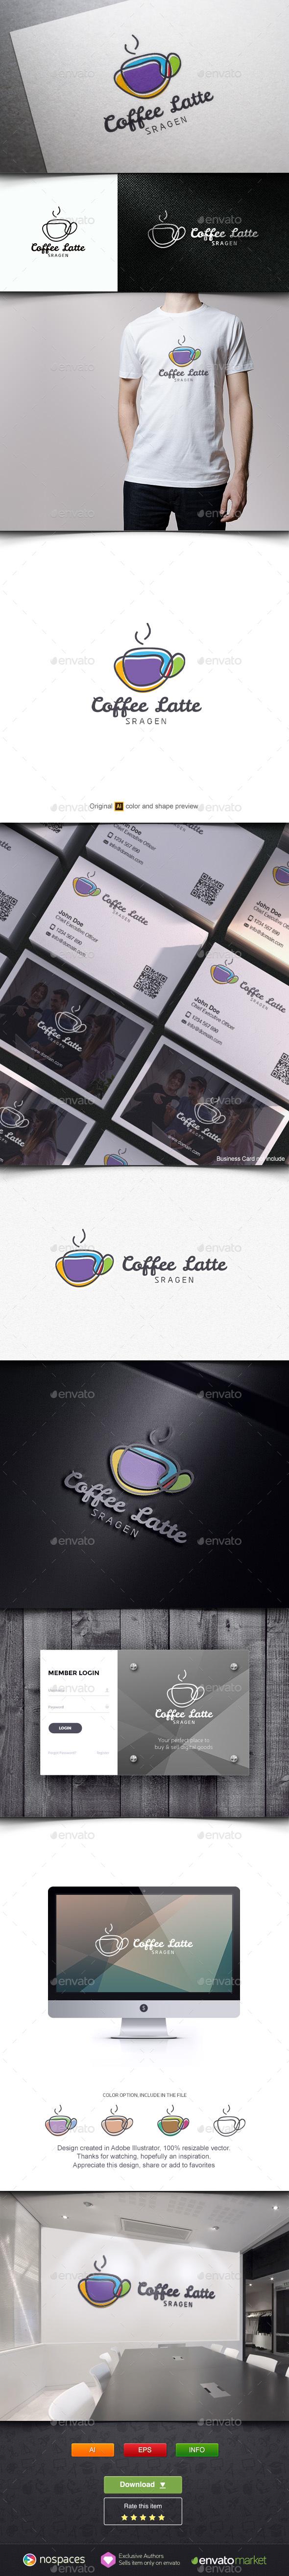 Coffee Latte Logo - Objects Logo Templates